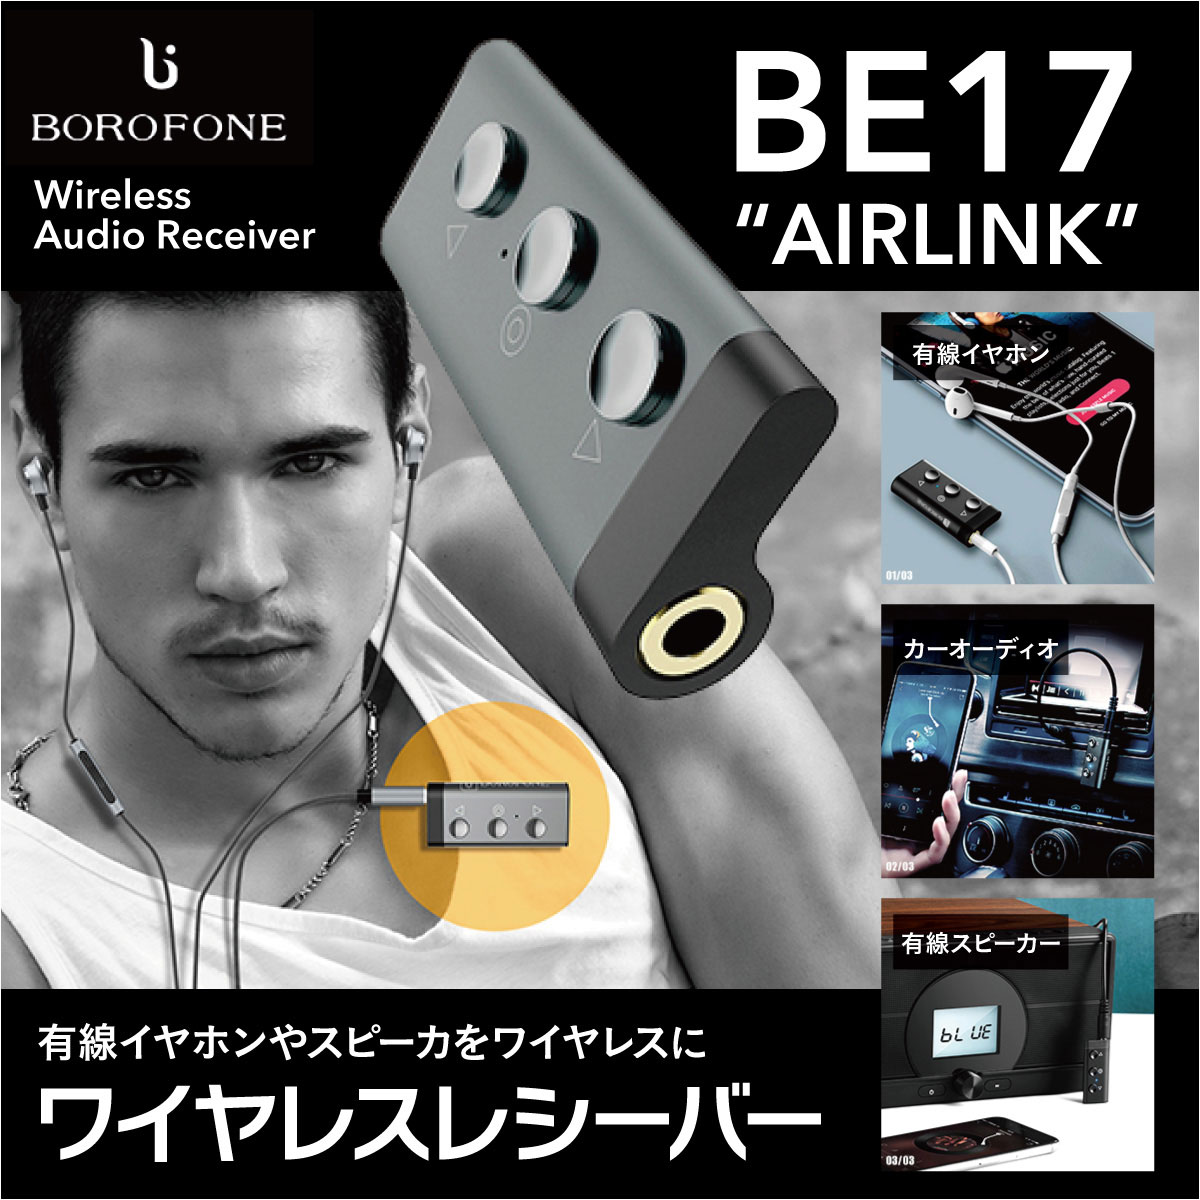 Wireless receiver wireless earphone wireless earphone headset headphones  Bluetooth iphone both ears sports earphone hands-free wireless earphone